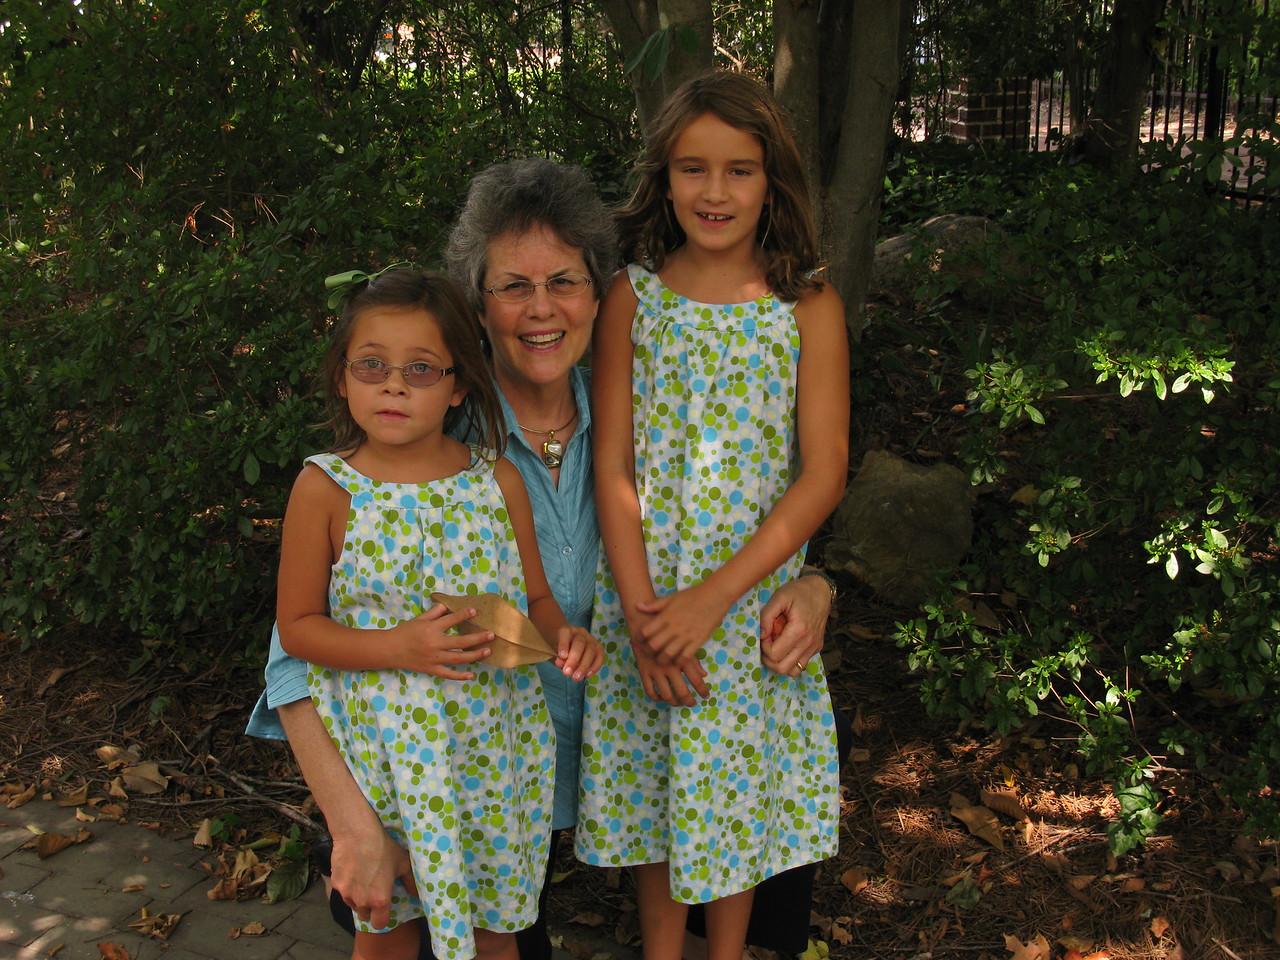 Girilie dresses